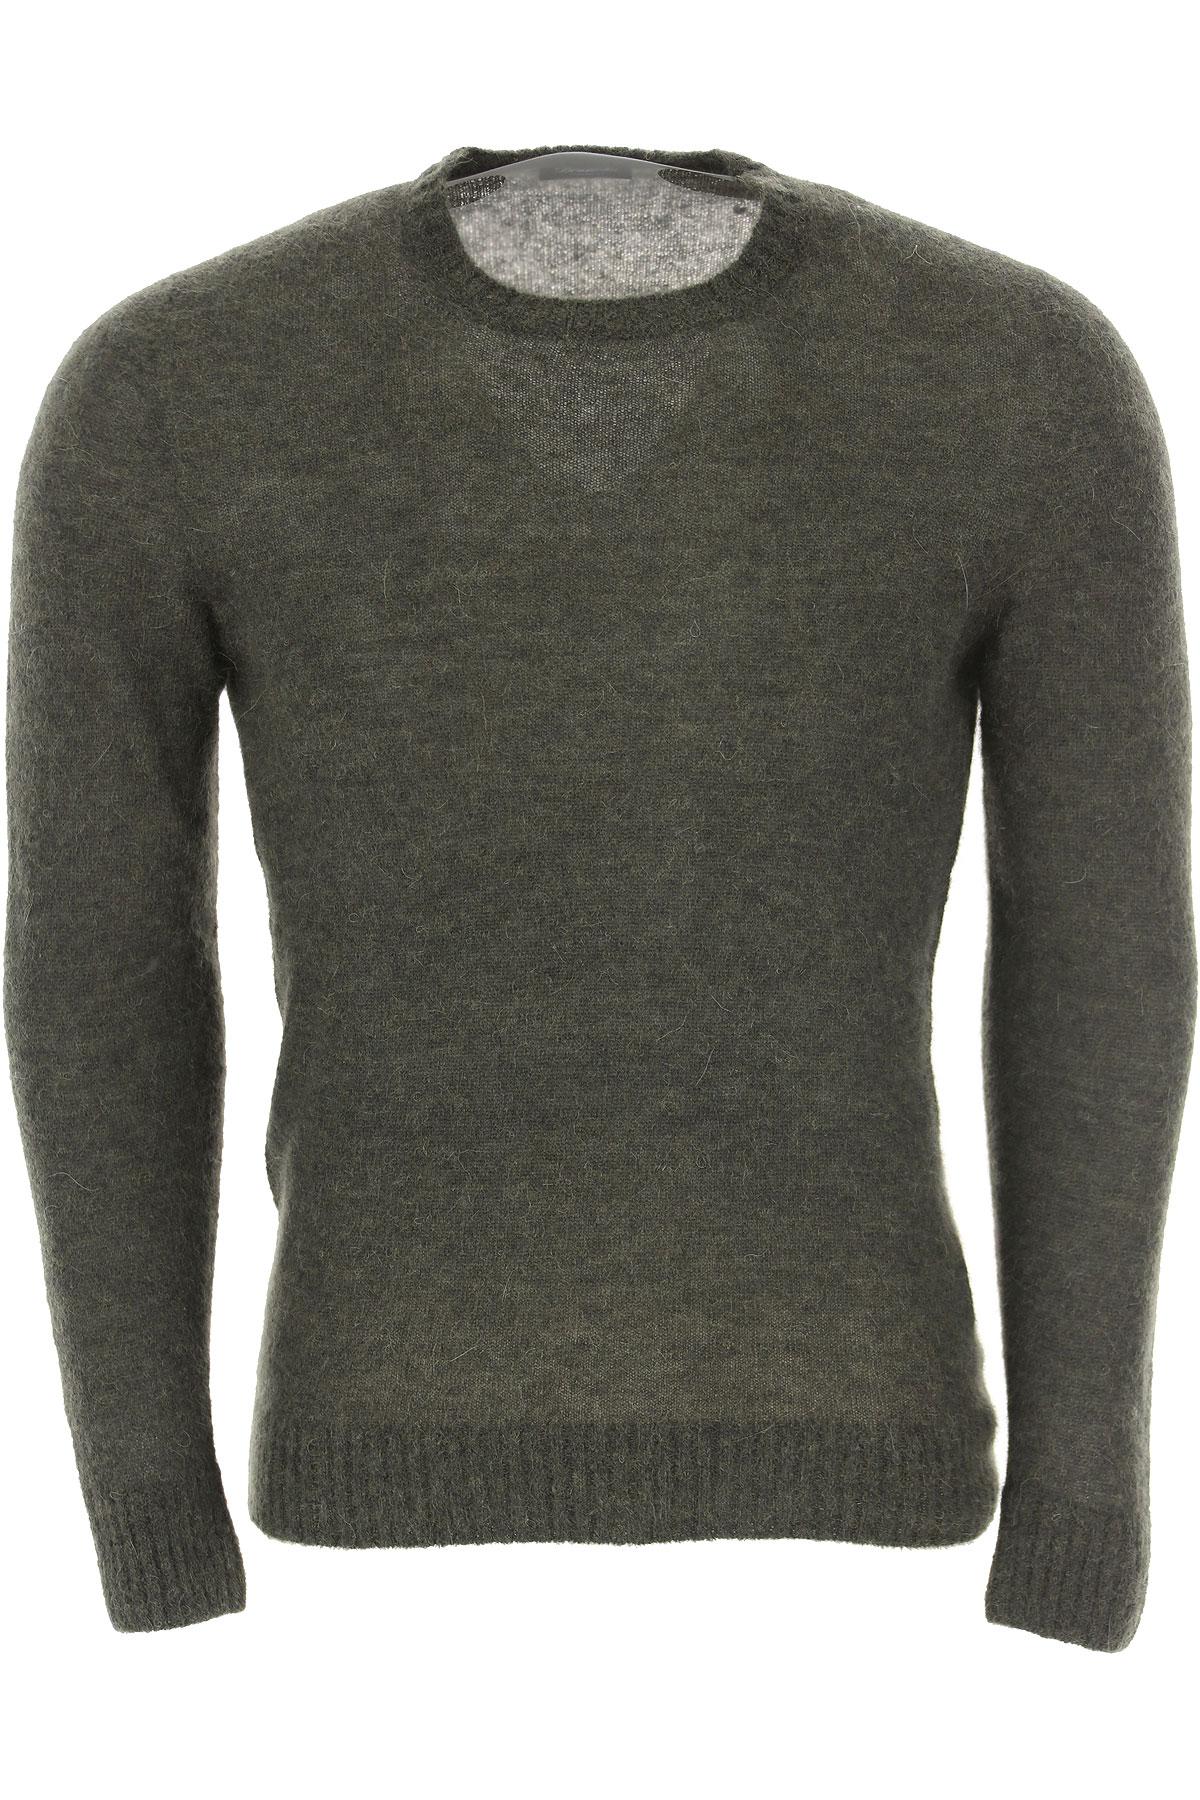 Drumohr Sweater for Men Jumper On Sale, Dark Green, Wool, 2019, L XL XXL